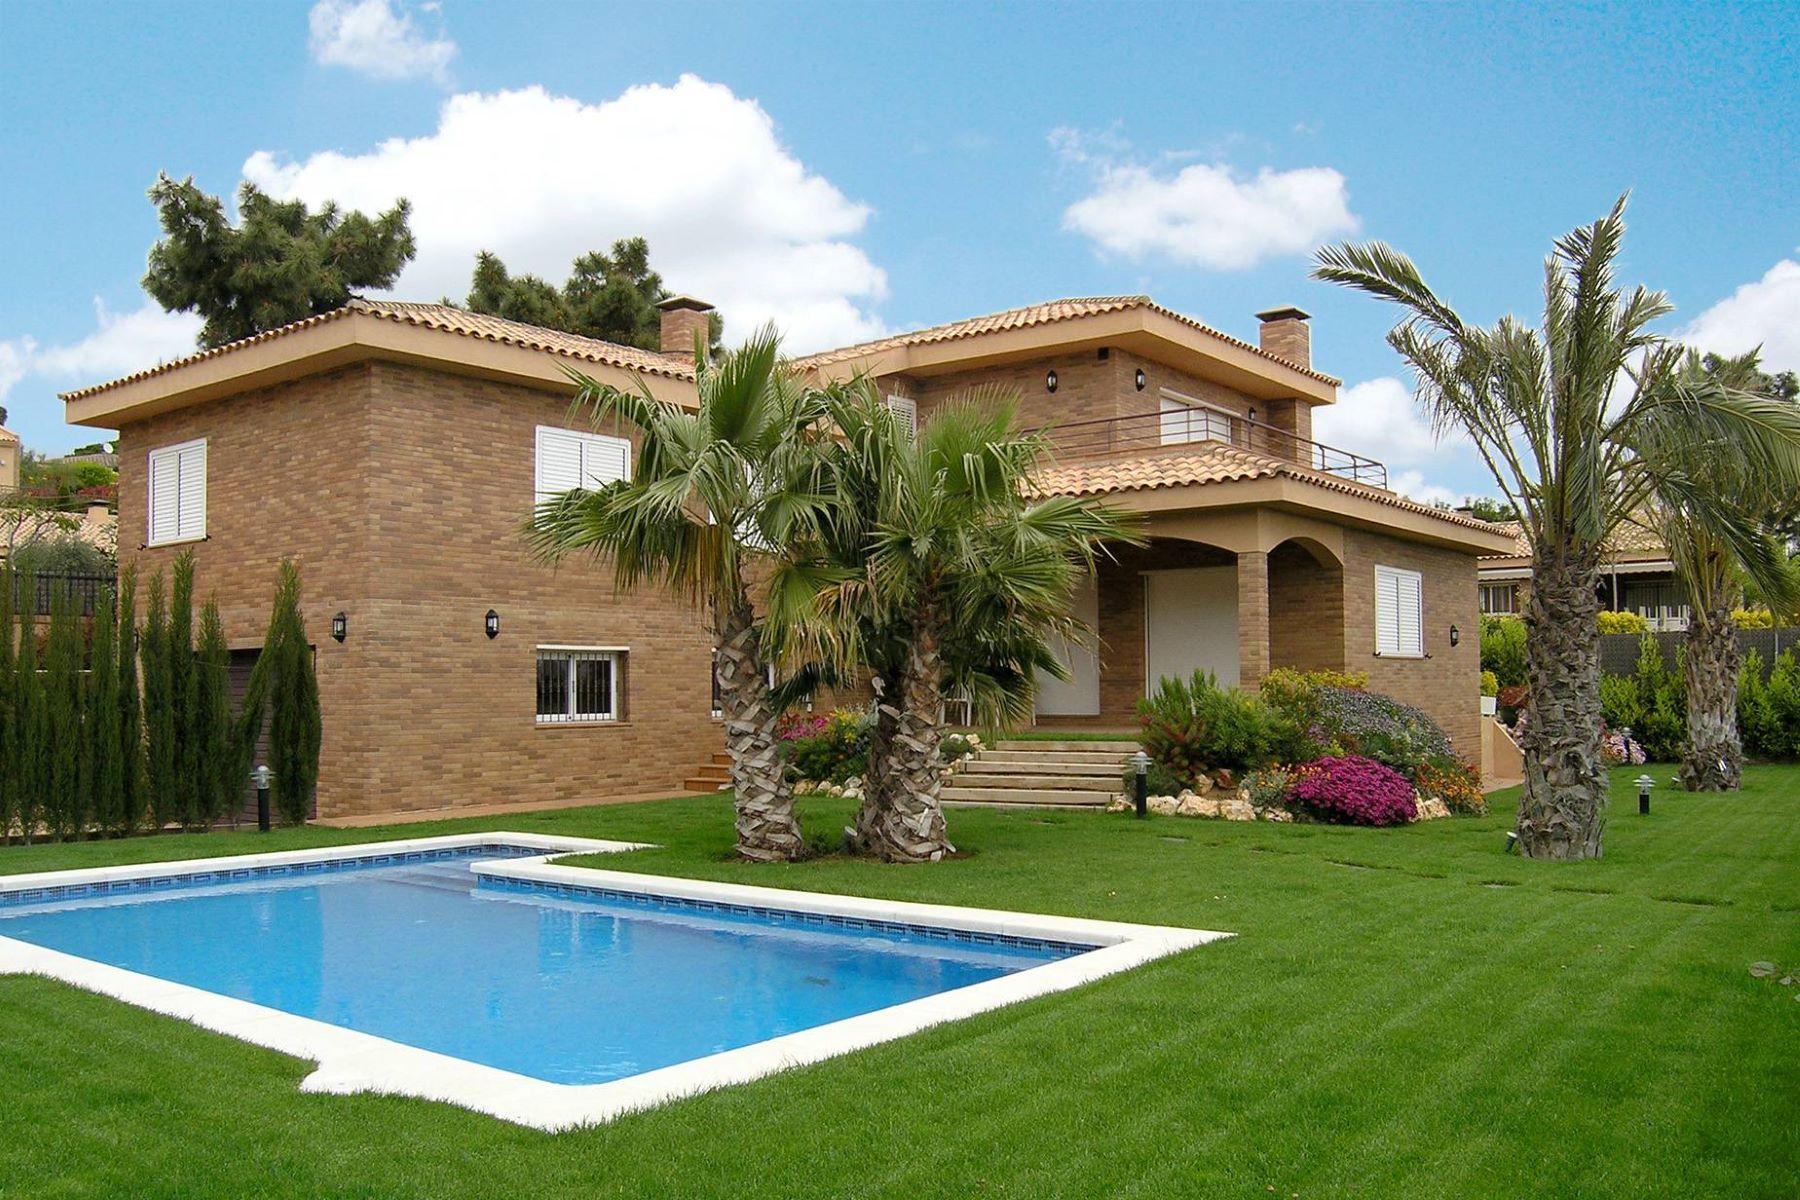 Single Family Home for Sale at Beautiful house in a quiet cozy development in Sant Pol de Mar Sant Pol De Mar, Barcelona, 08395 Spain